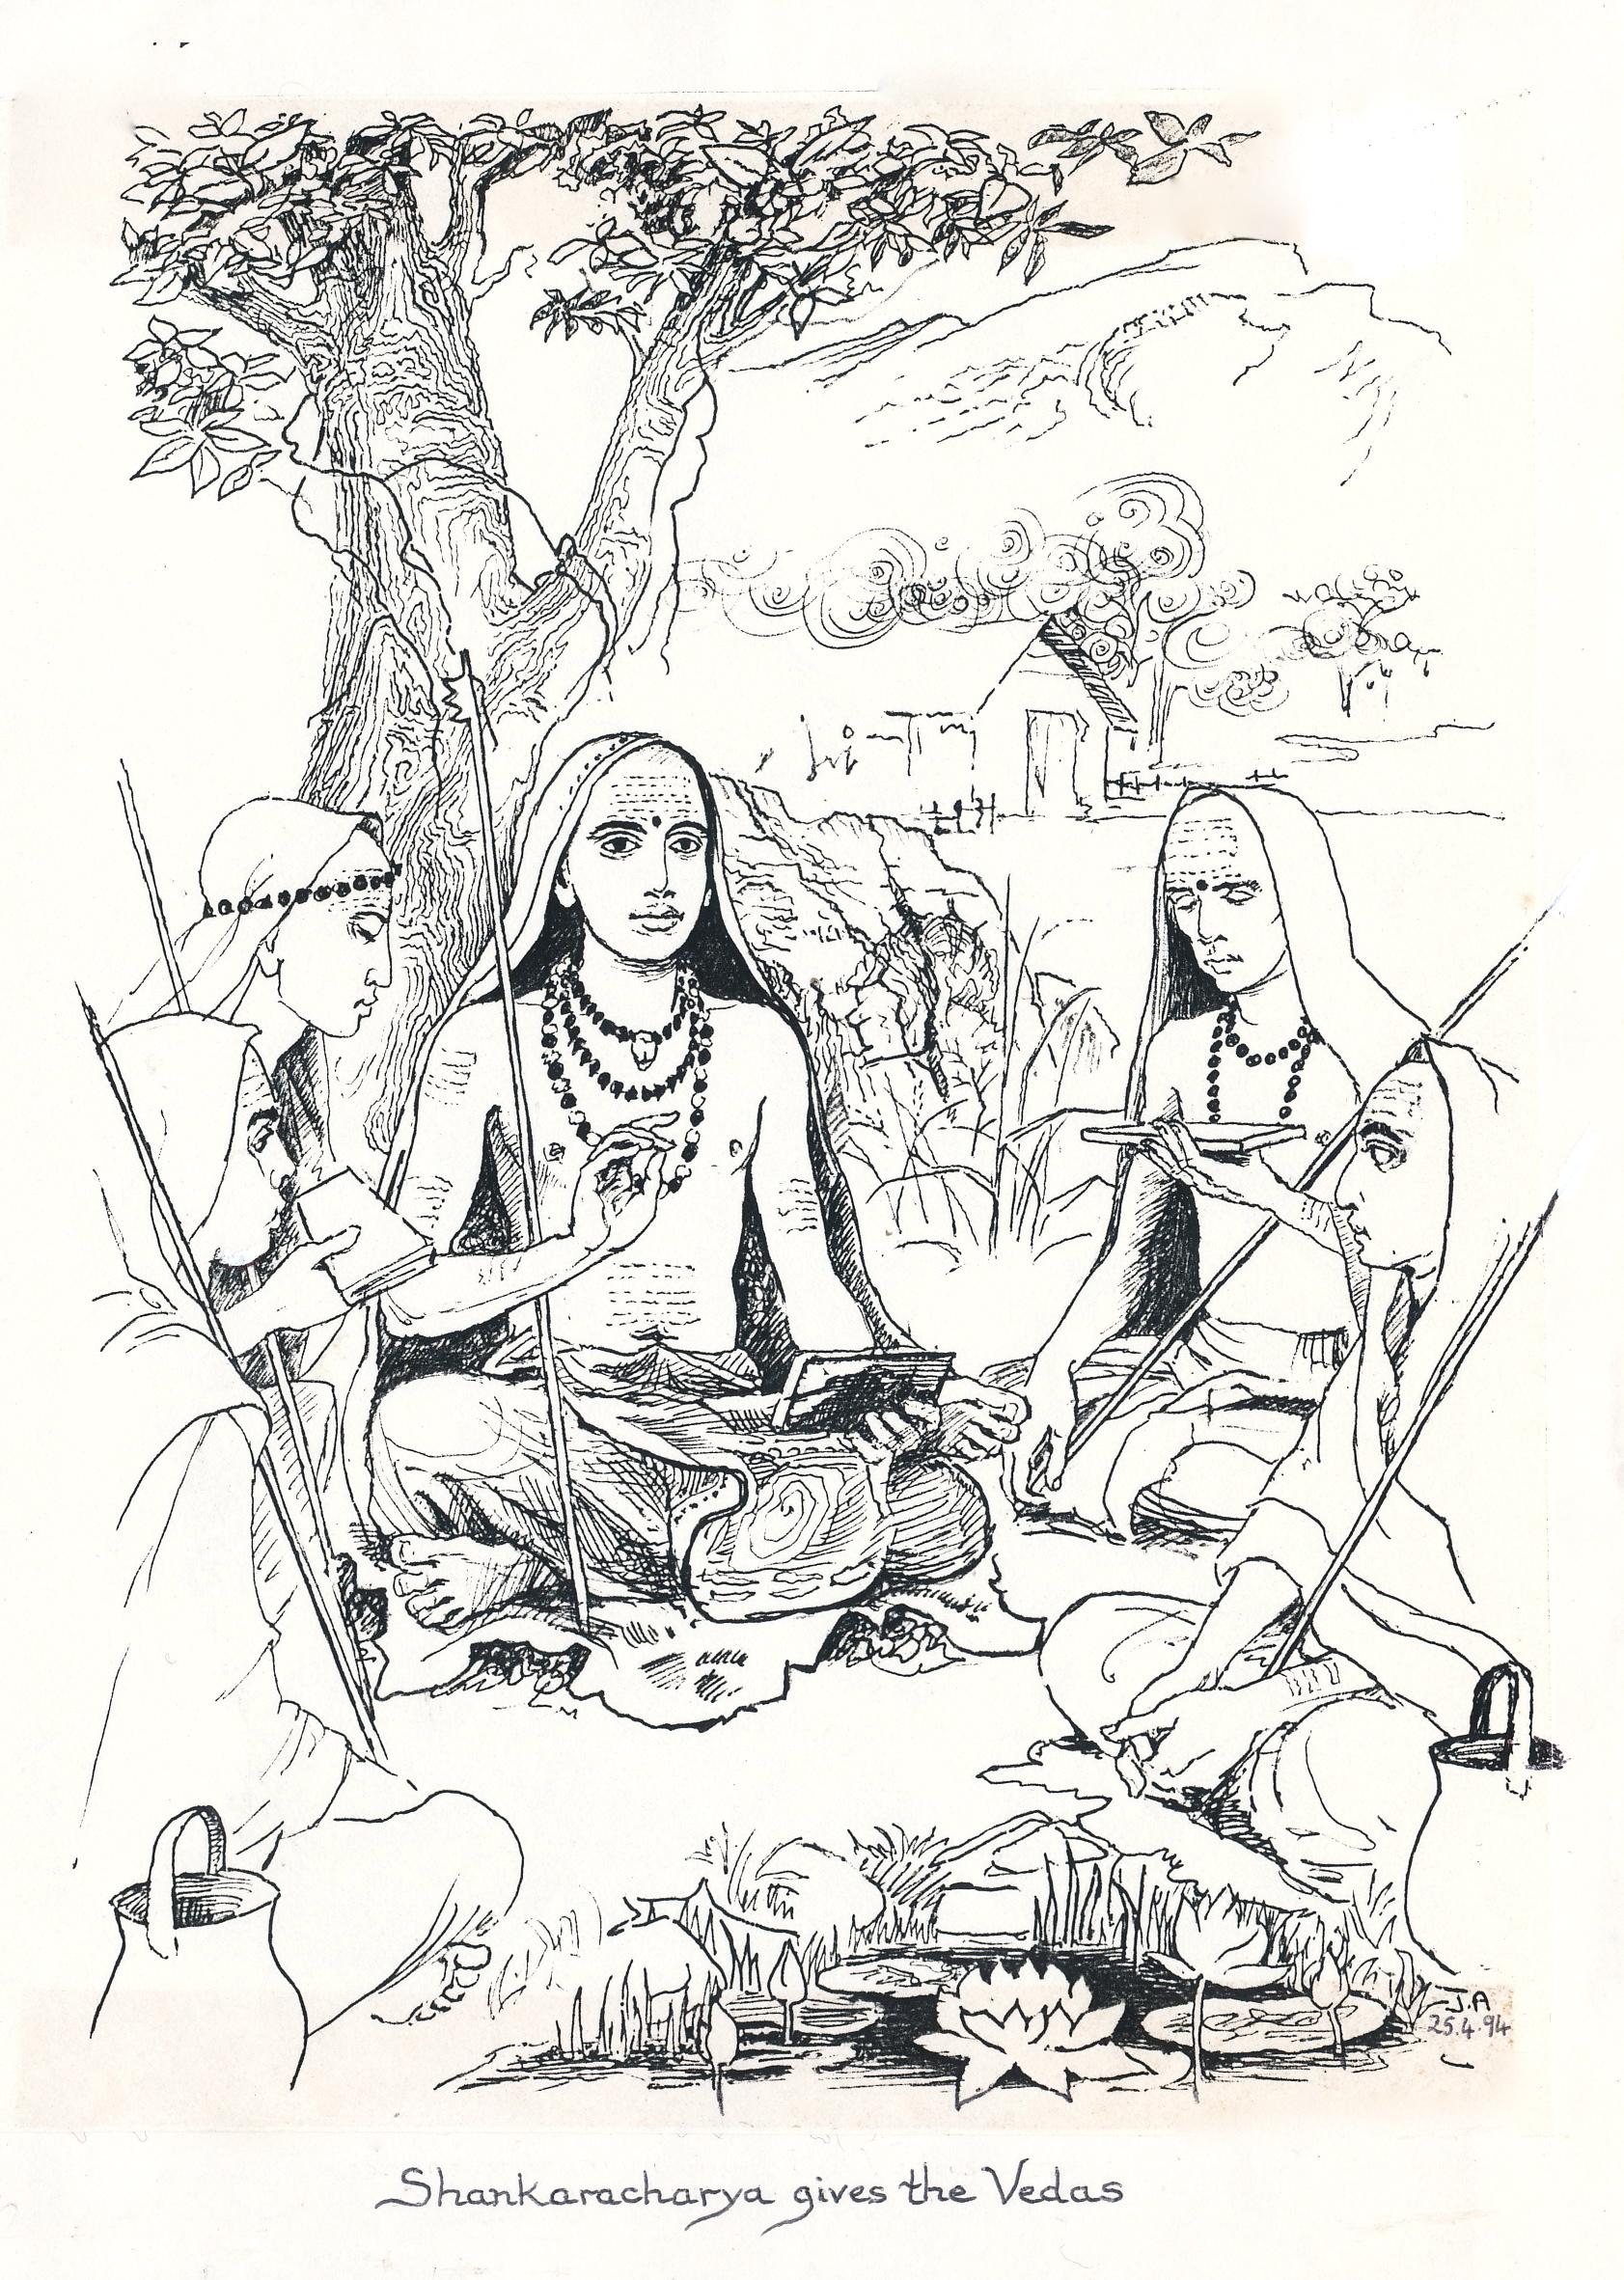 Ganapati Muni's Science of Mantra